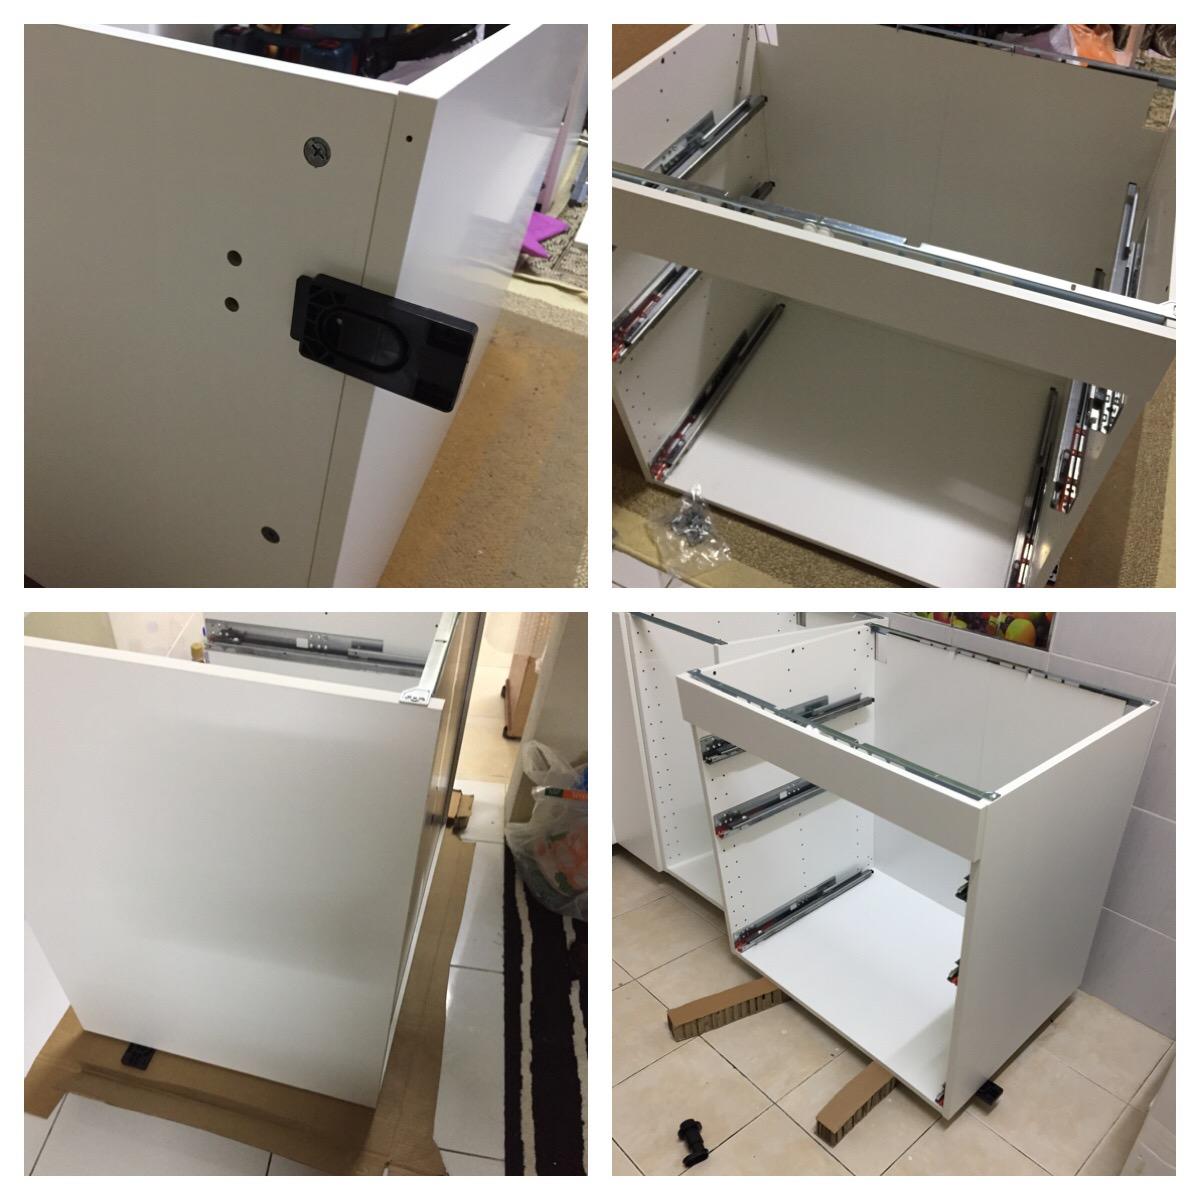 Pasang Kabinet Dapur Ikea Part 2 Padinrose Tips Hobi Dan Motivasi